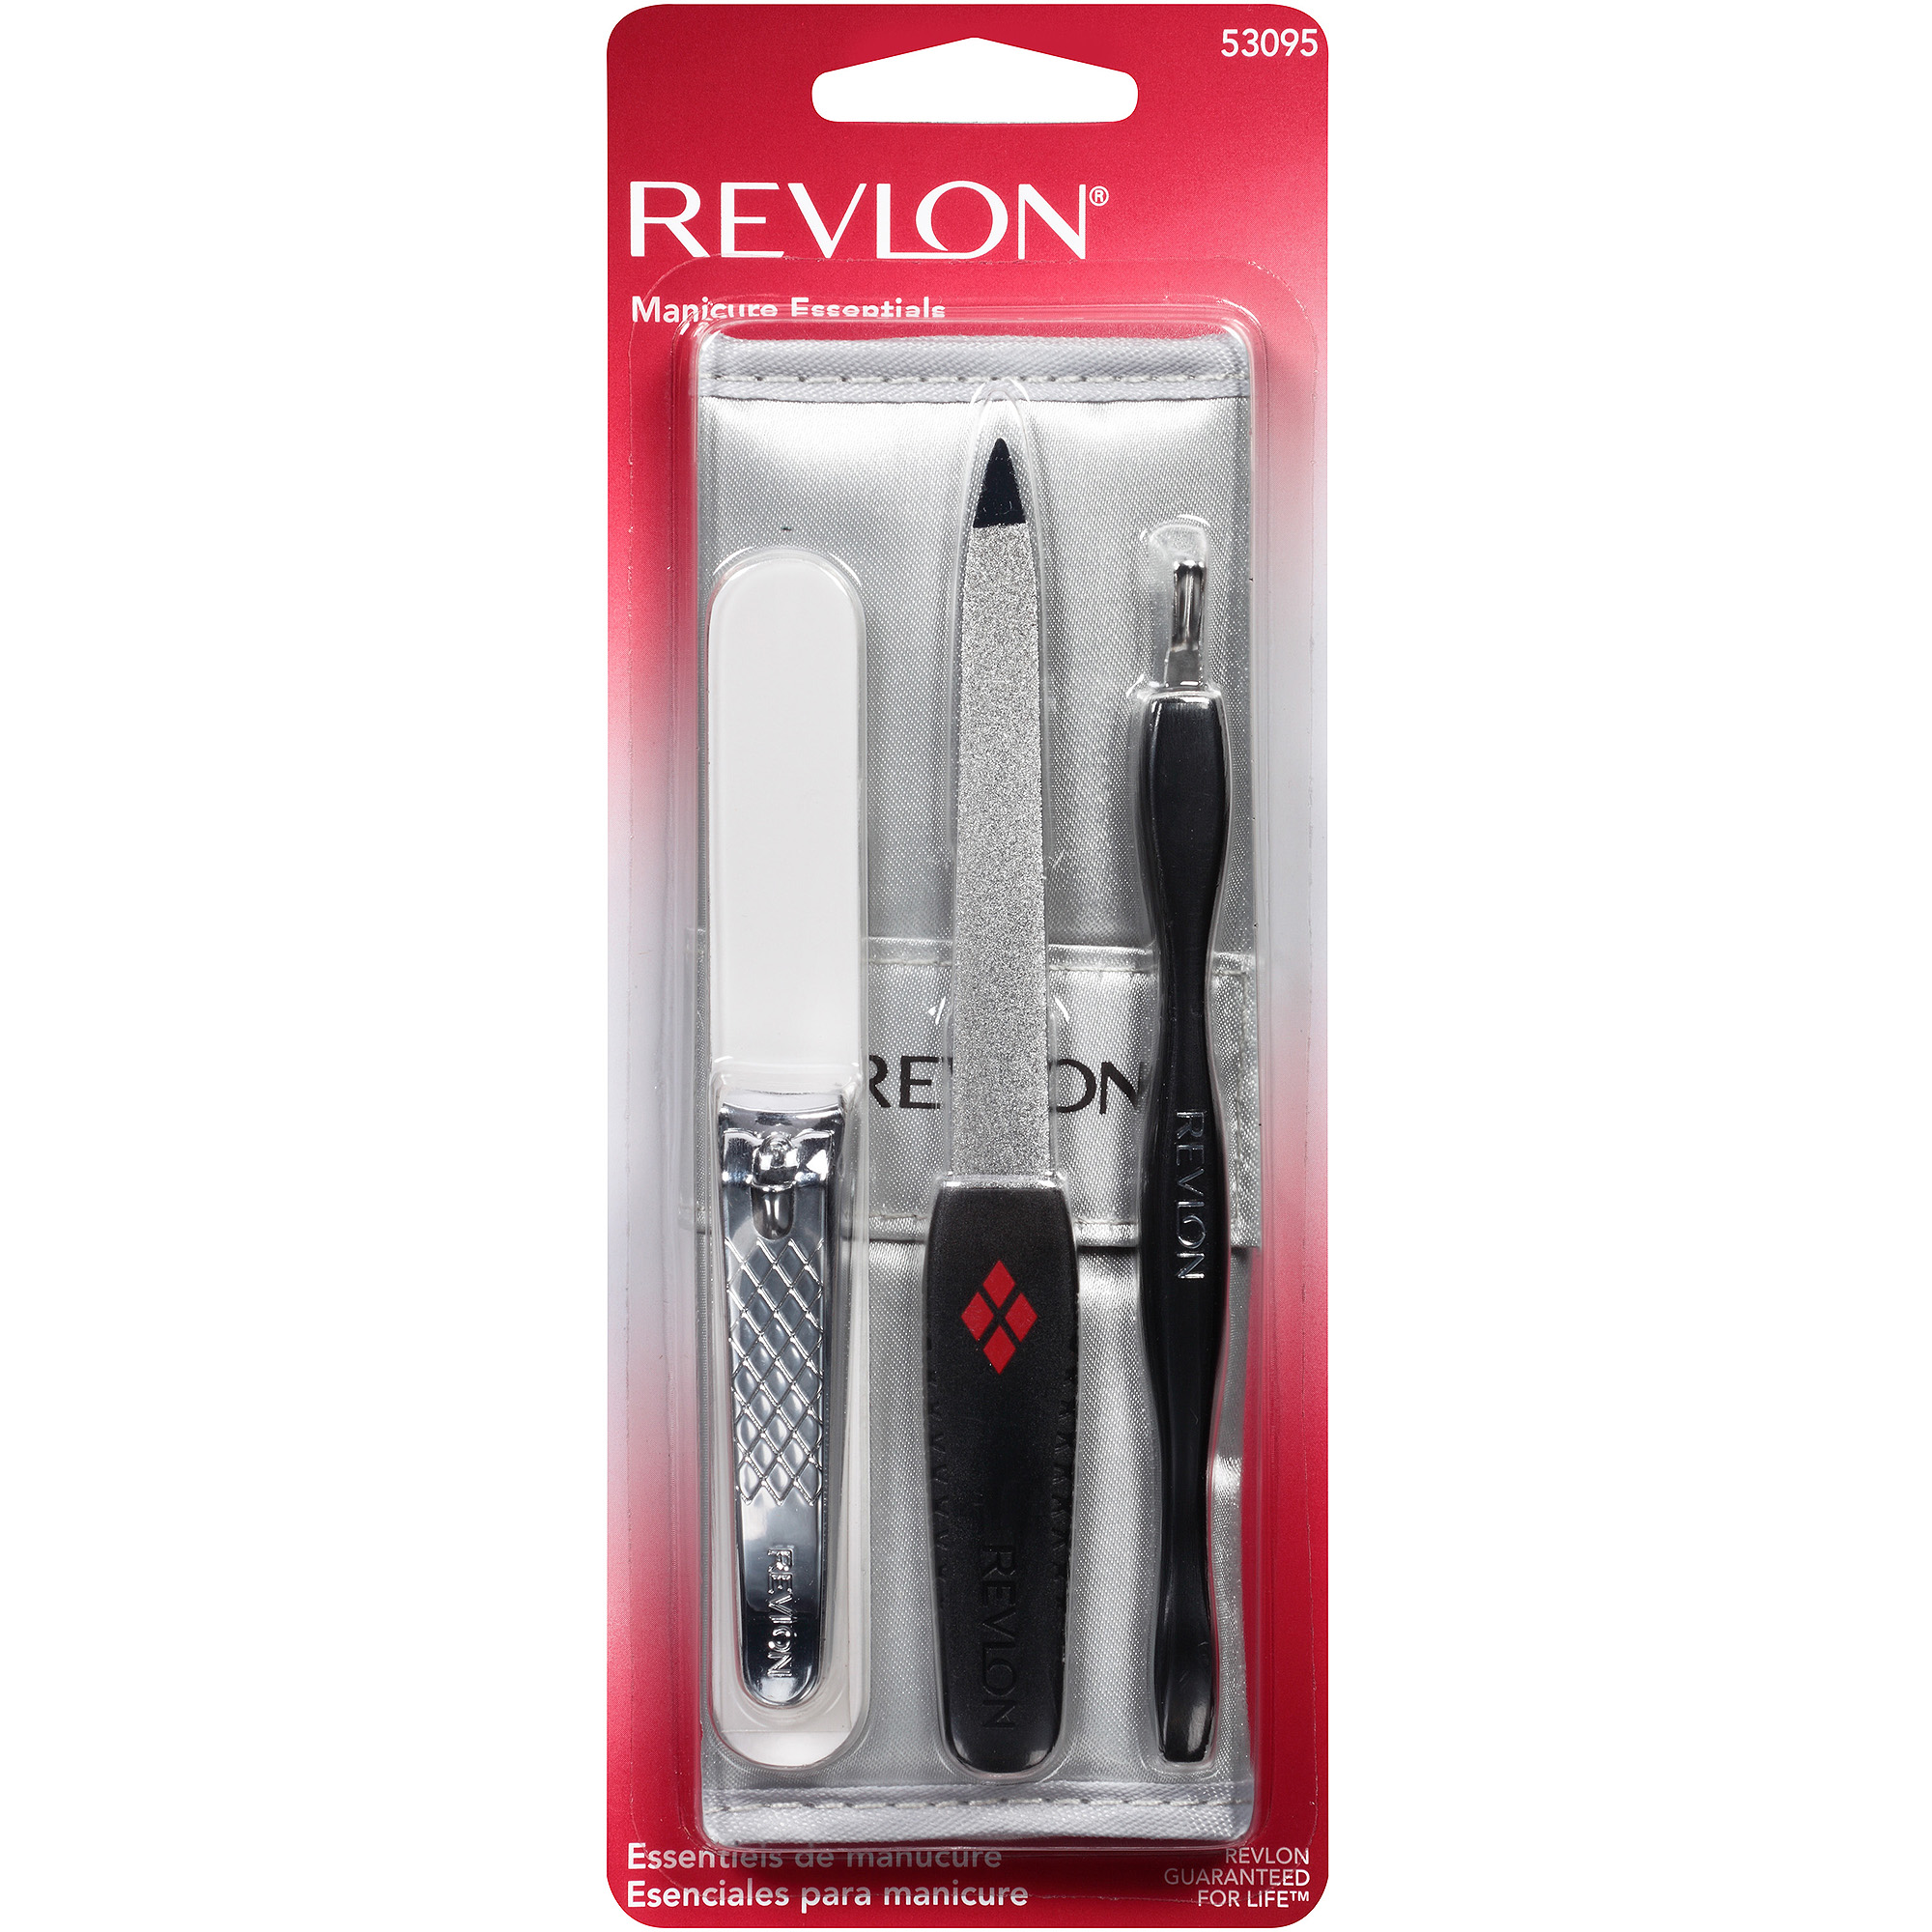 Revlon Manicure-to-Go